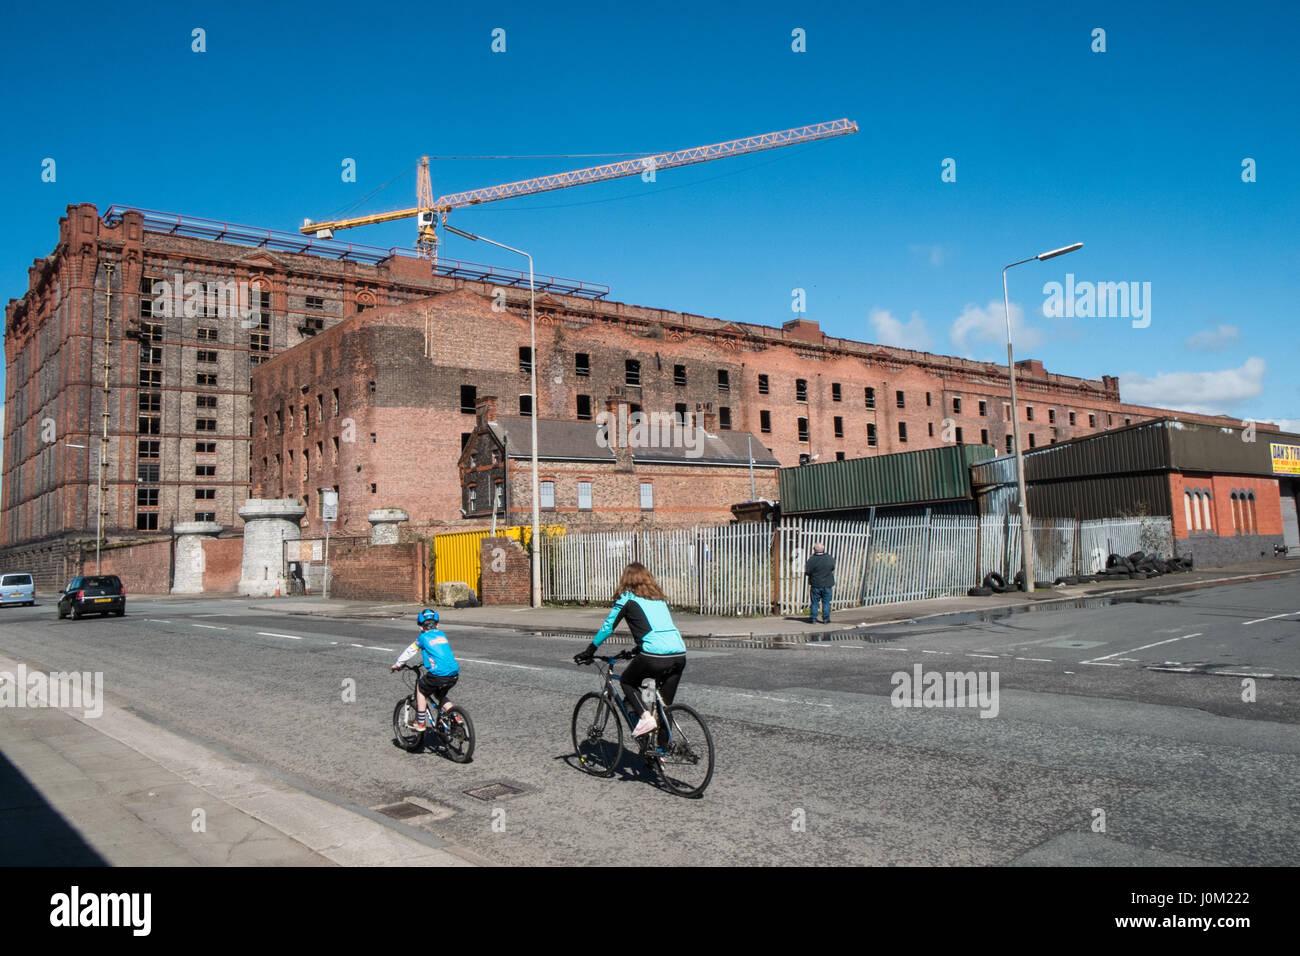 Liverpool,Merseyside,England,UNESCO,World Heritage City,City,Northern,North,England,English,UK. Stock Photo